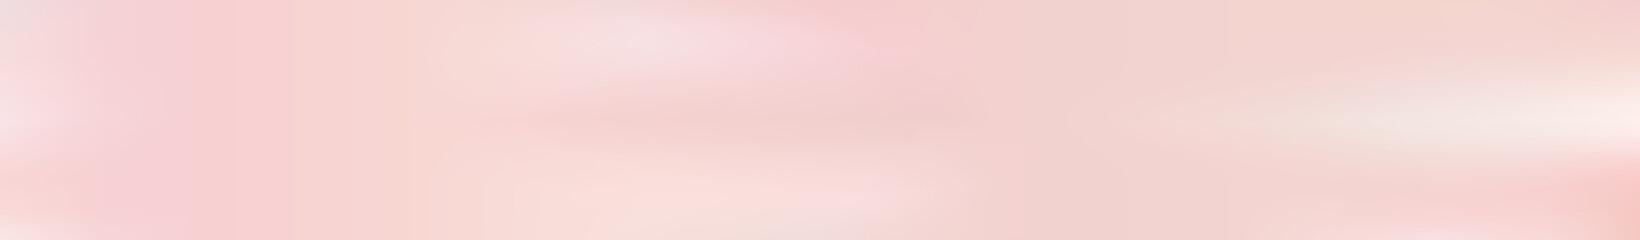 Panoramic pink background.